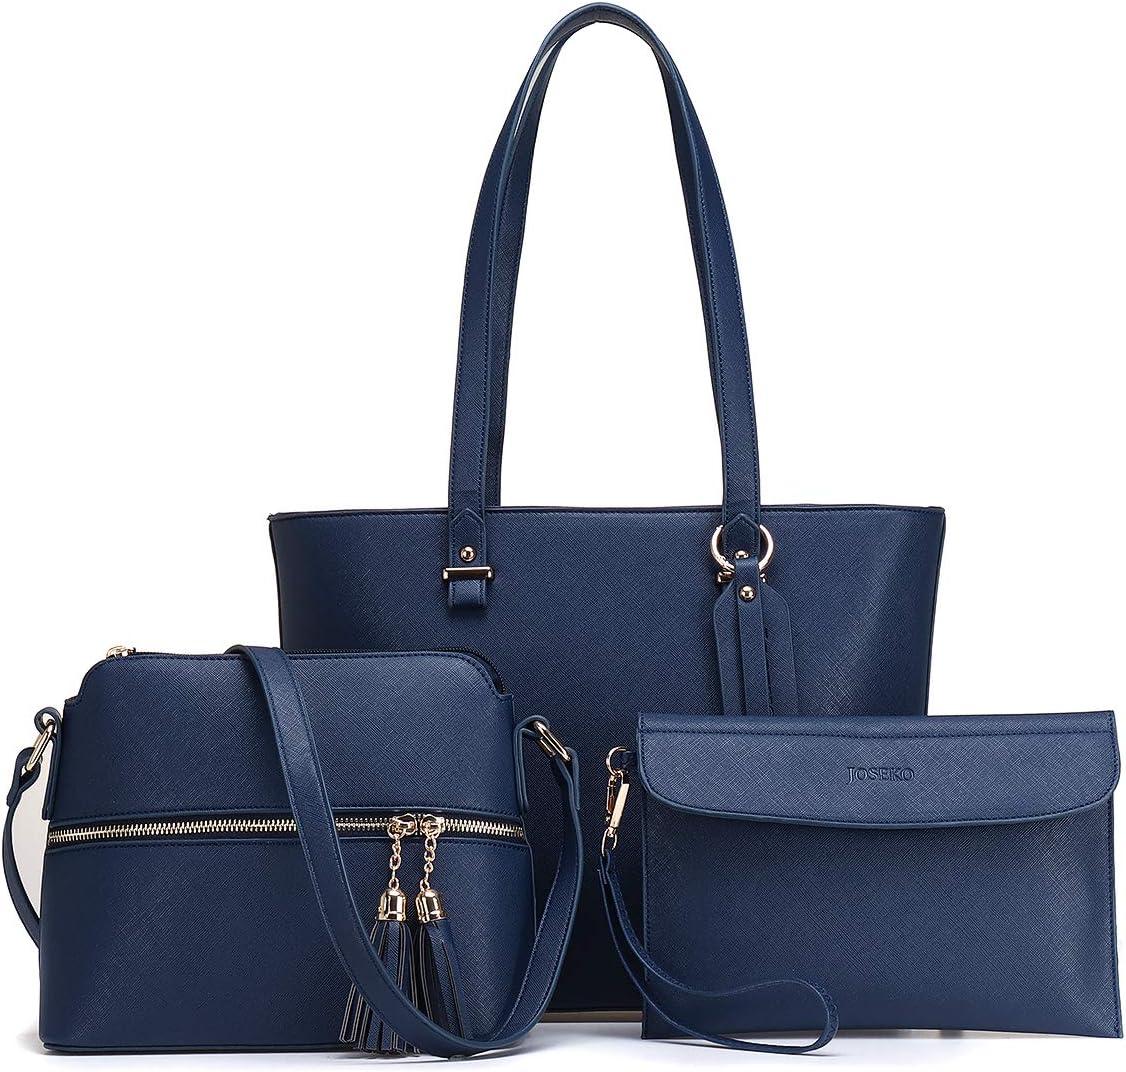 Handbags for Women, JOSEKO Fashion Tote Shoulder bags Crossbody Bags Top Handle Satchel Hobo 3pcs Purse Set Blue